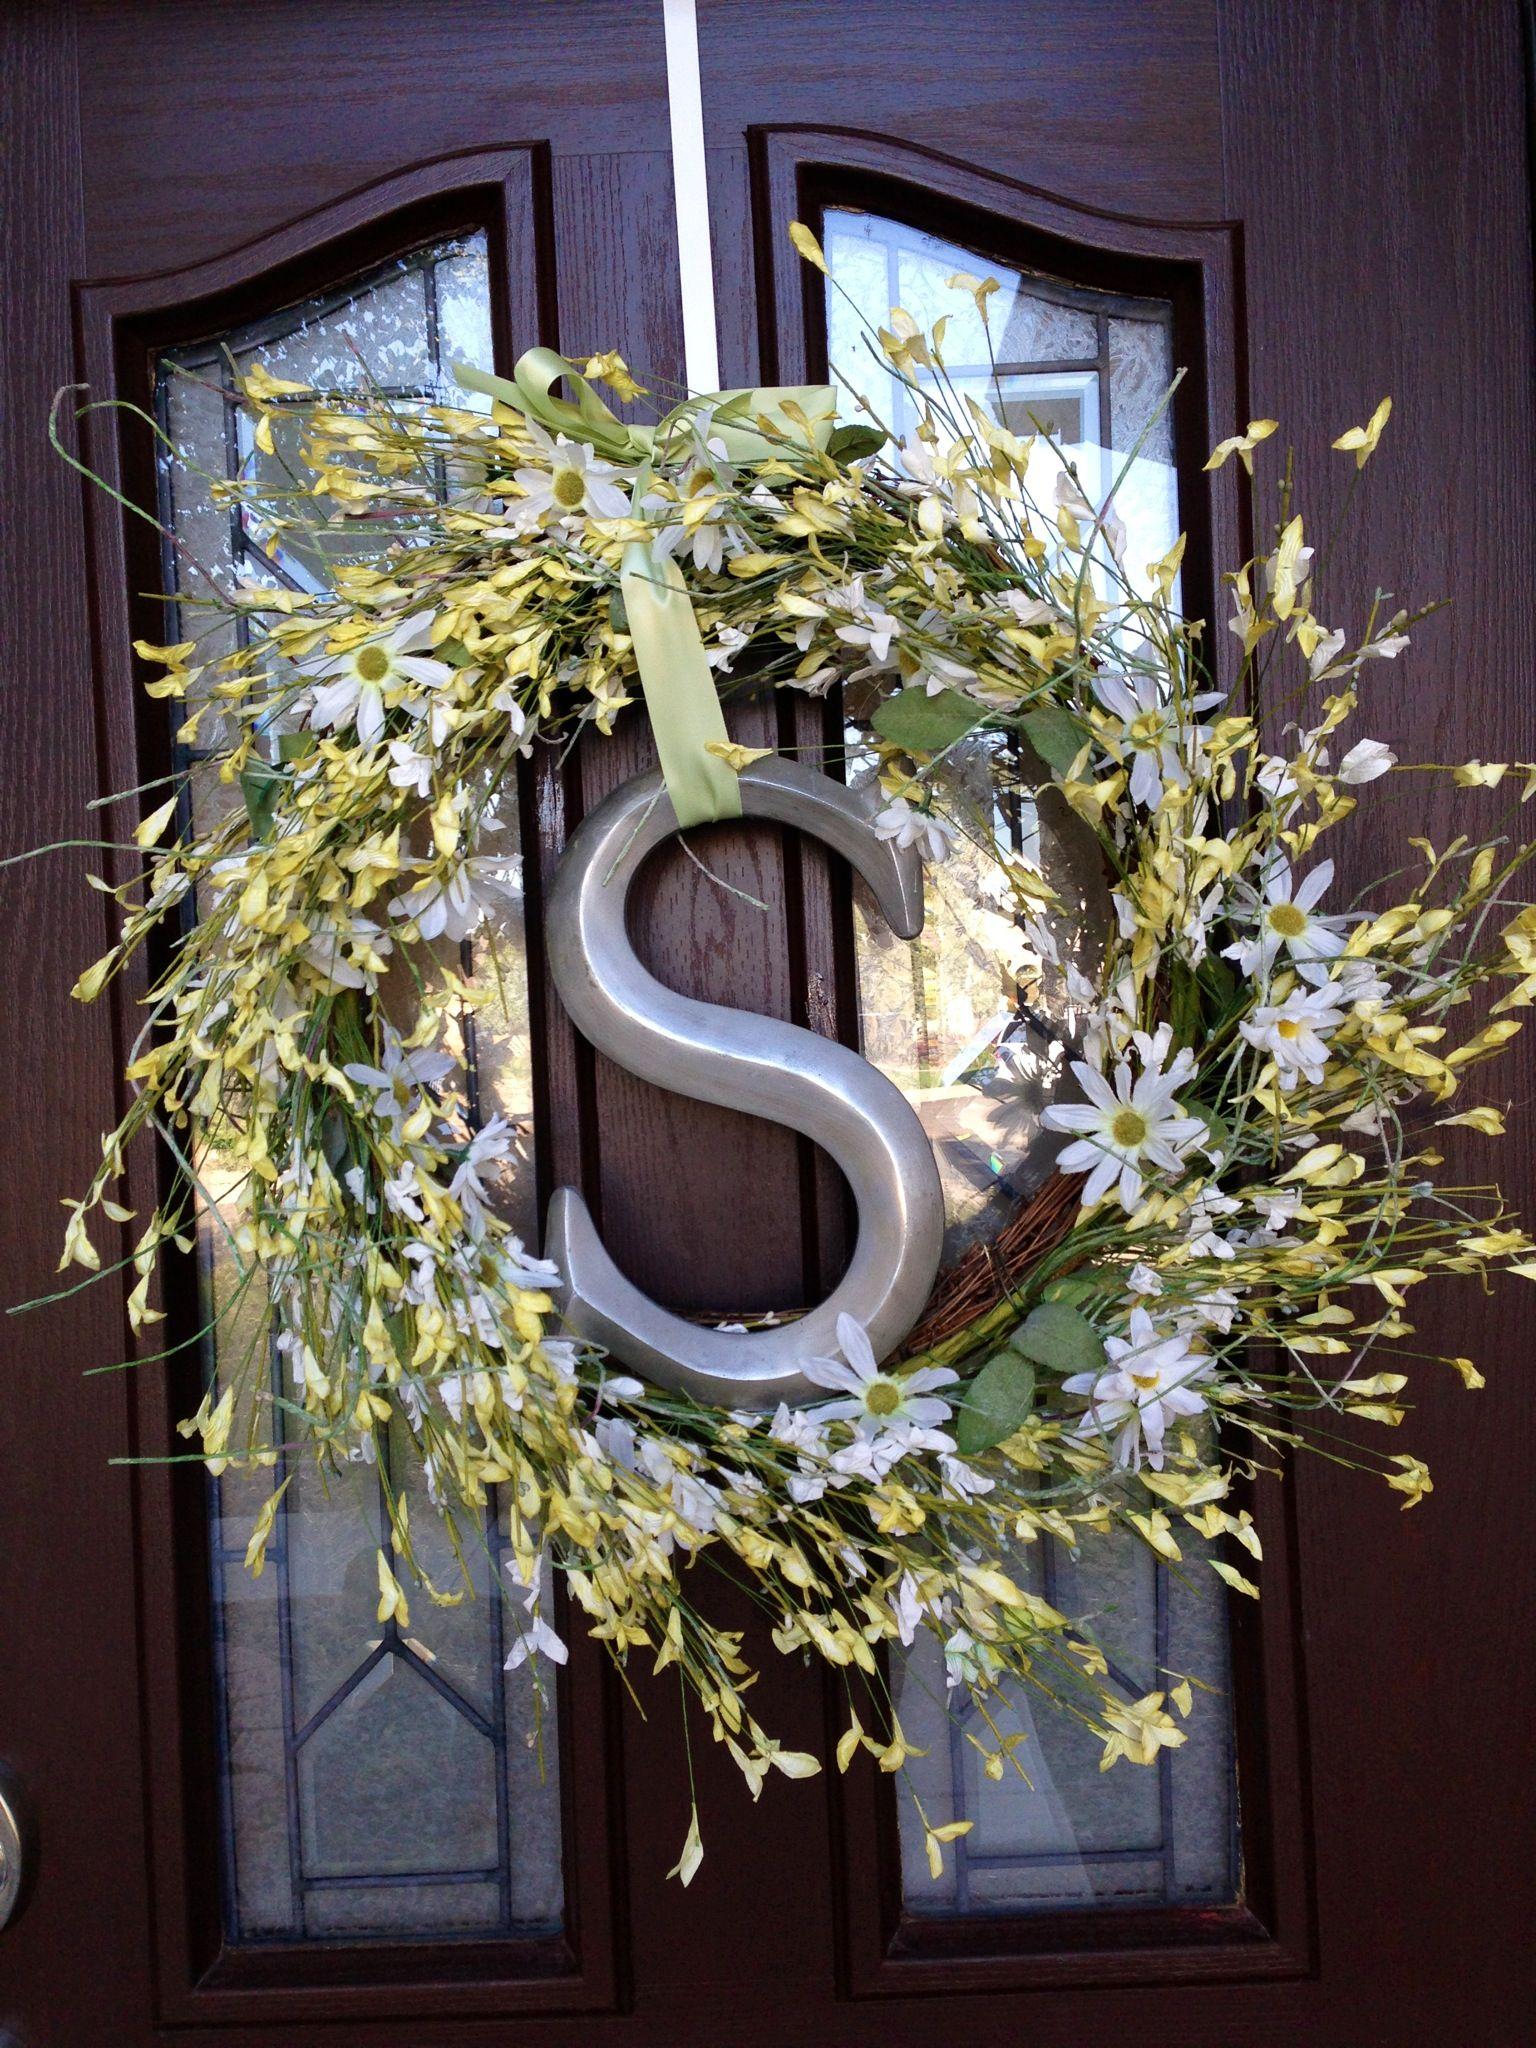 Diy Wreath Hobby Lobby Wreath Initial Ribbon Diy Wreath Door Wreath Hanger Diy Crafts